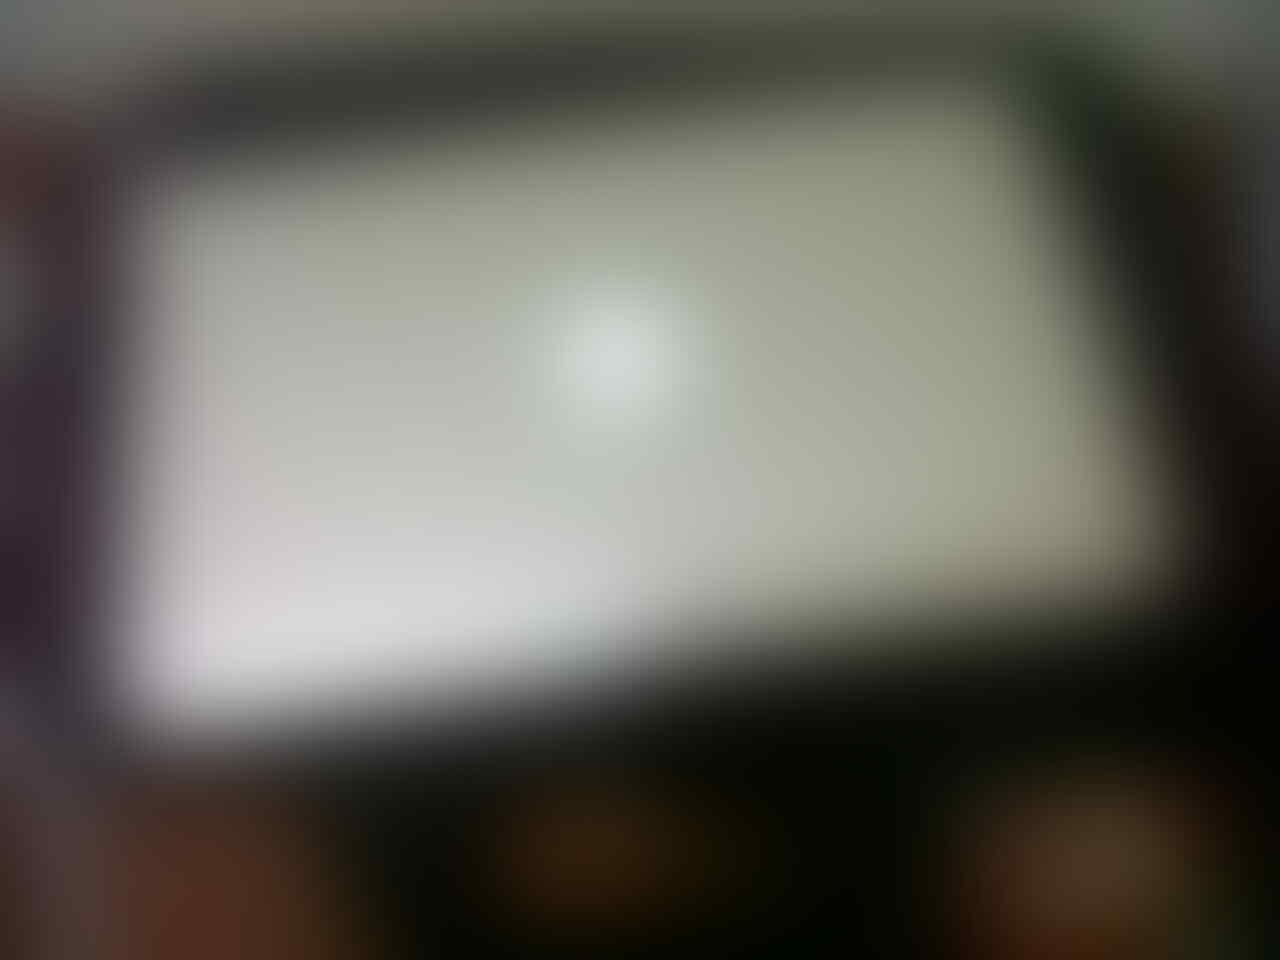 WTS Macbook Air Core i5 SSD 64GB RAM 2GB LIKE NEW MURAH KLIK GAN